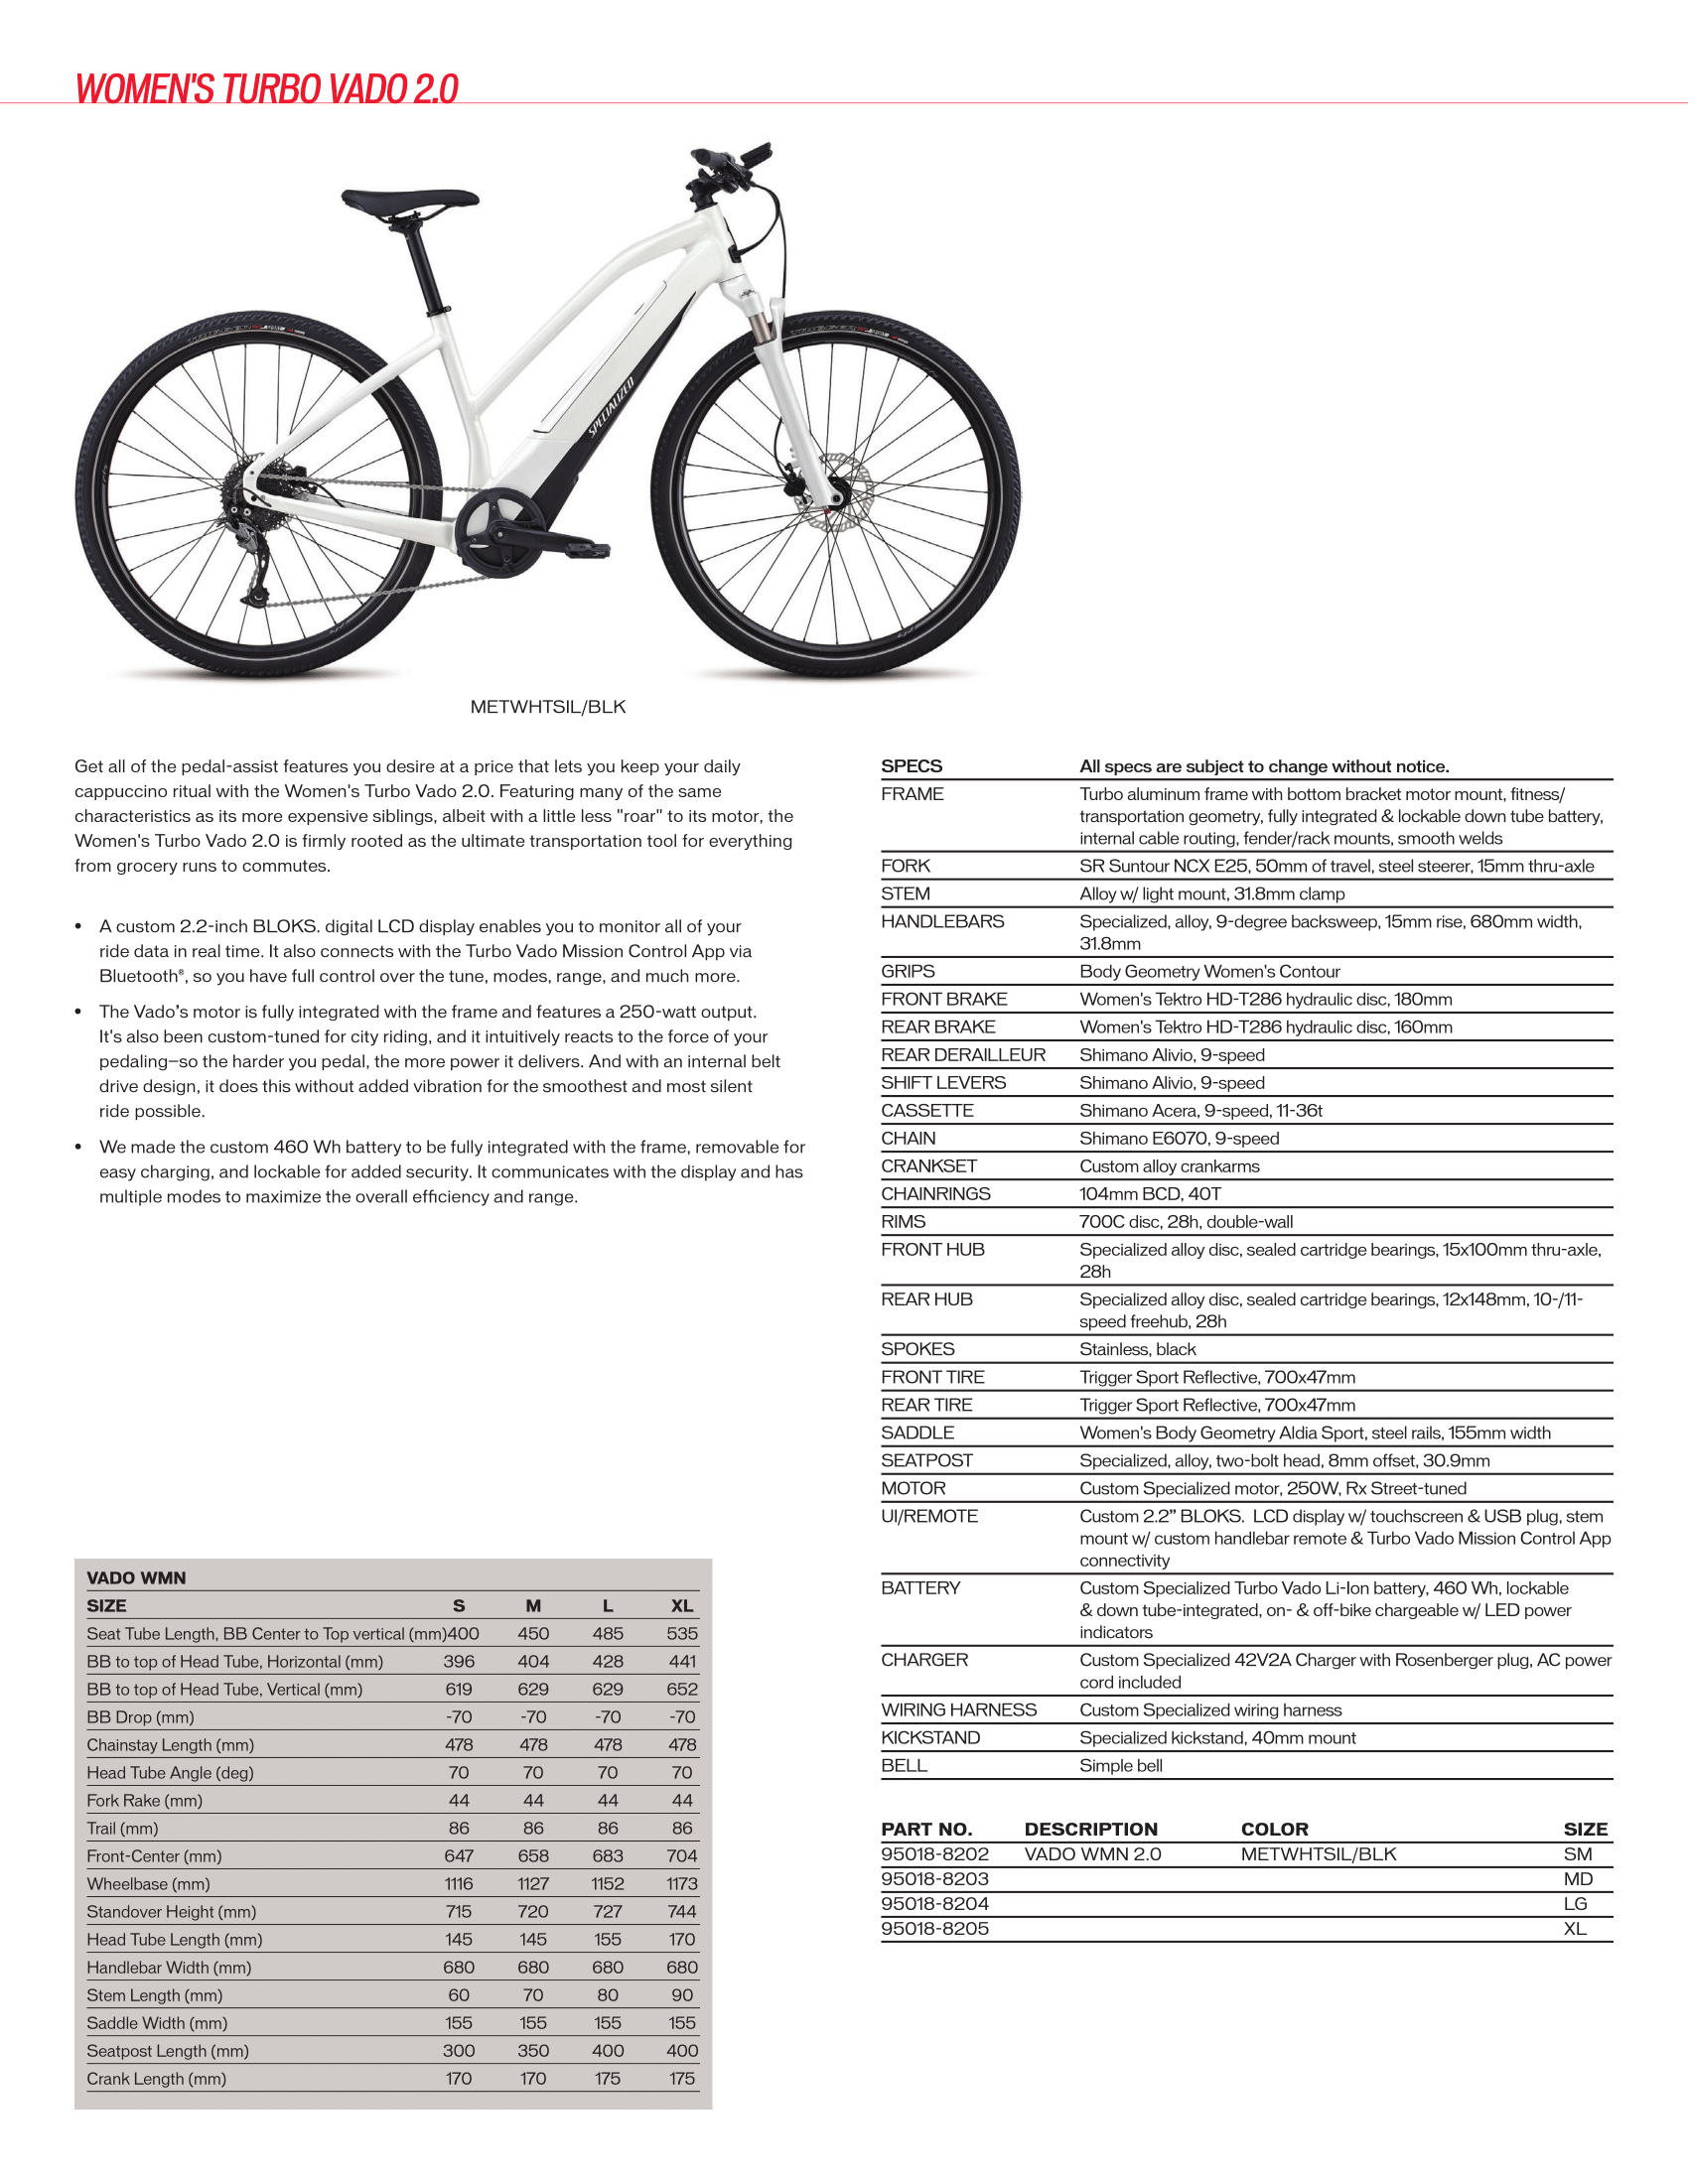 Women's Specialized Turbo Vado 2.0 (E-Bikes)